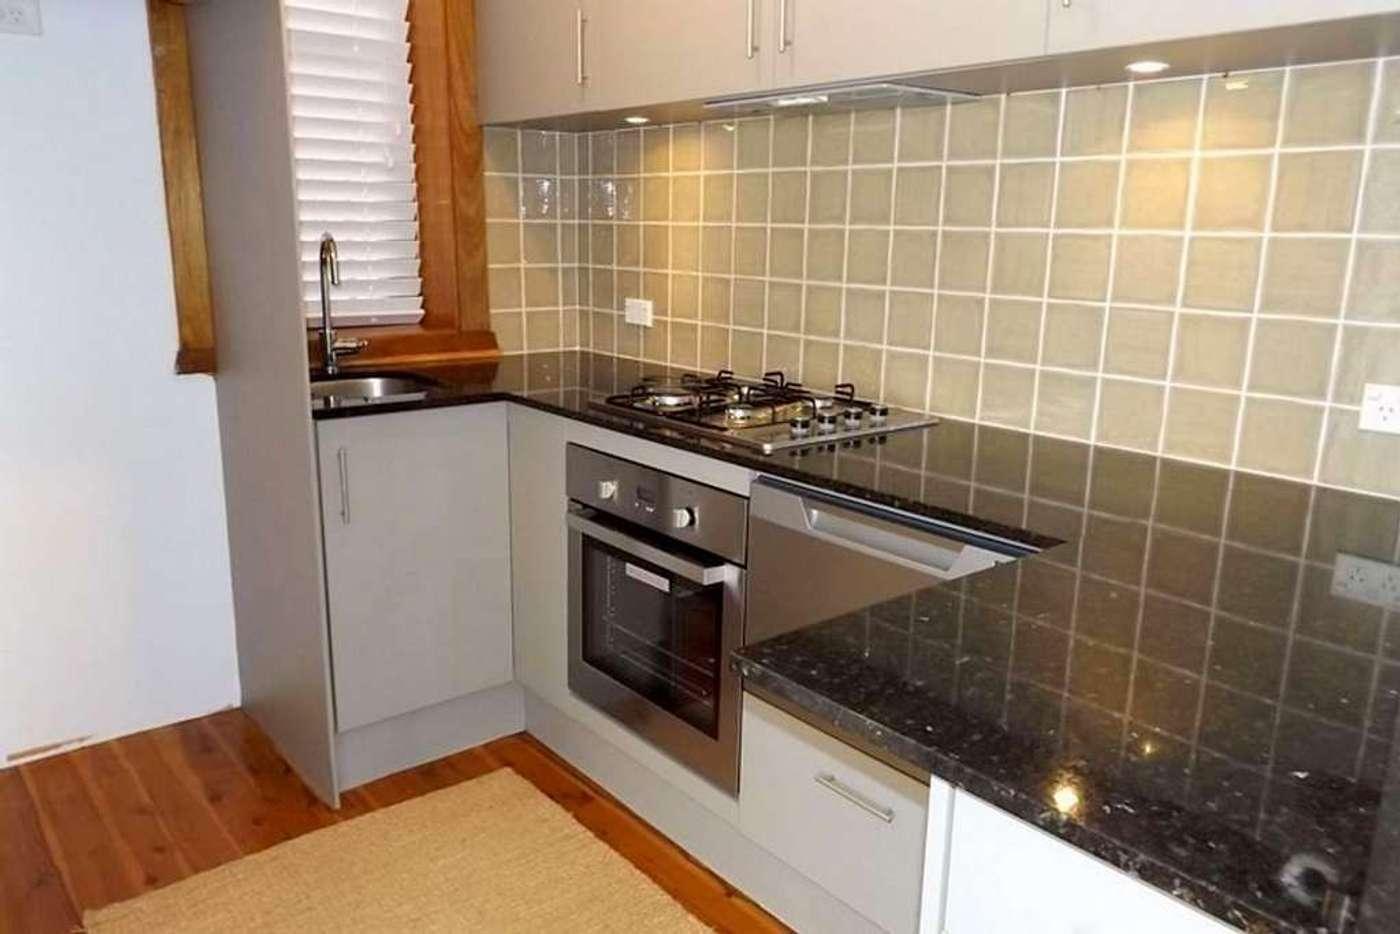 Main view of Homely apartment listing, 2/34A Fletcher Street, Bondi Beach NSW 2026